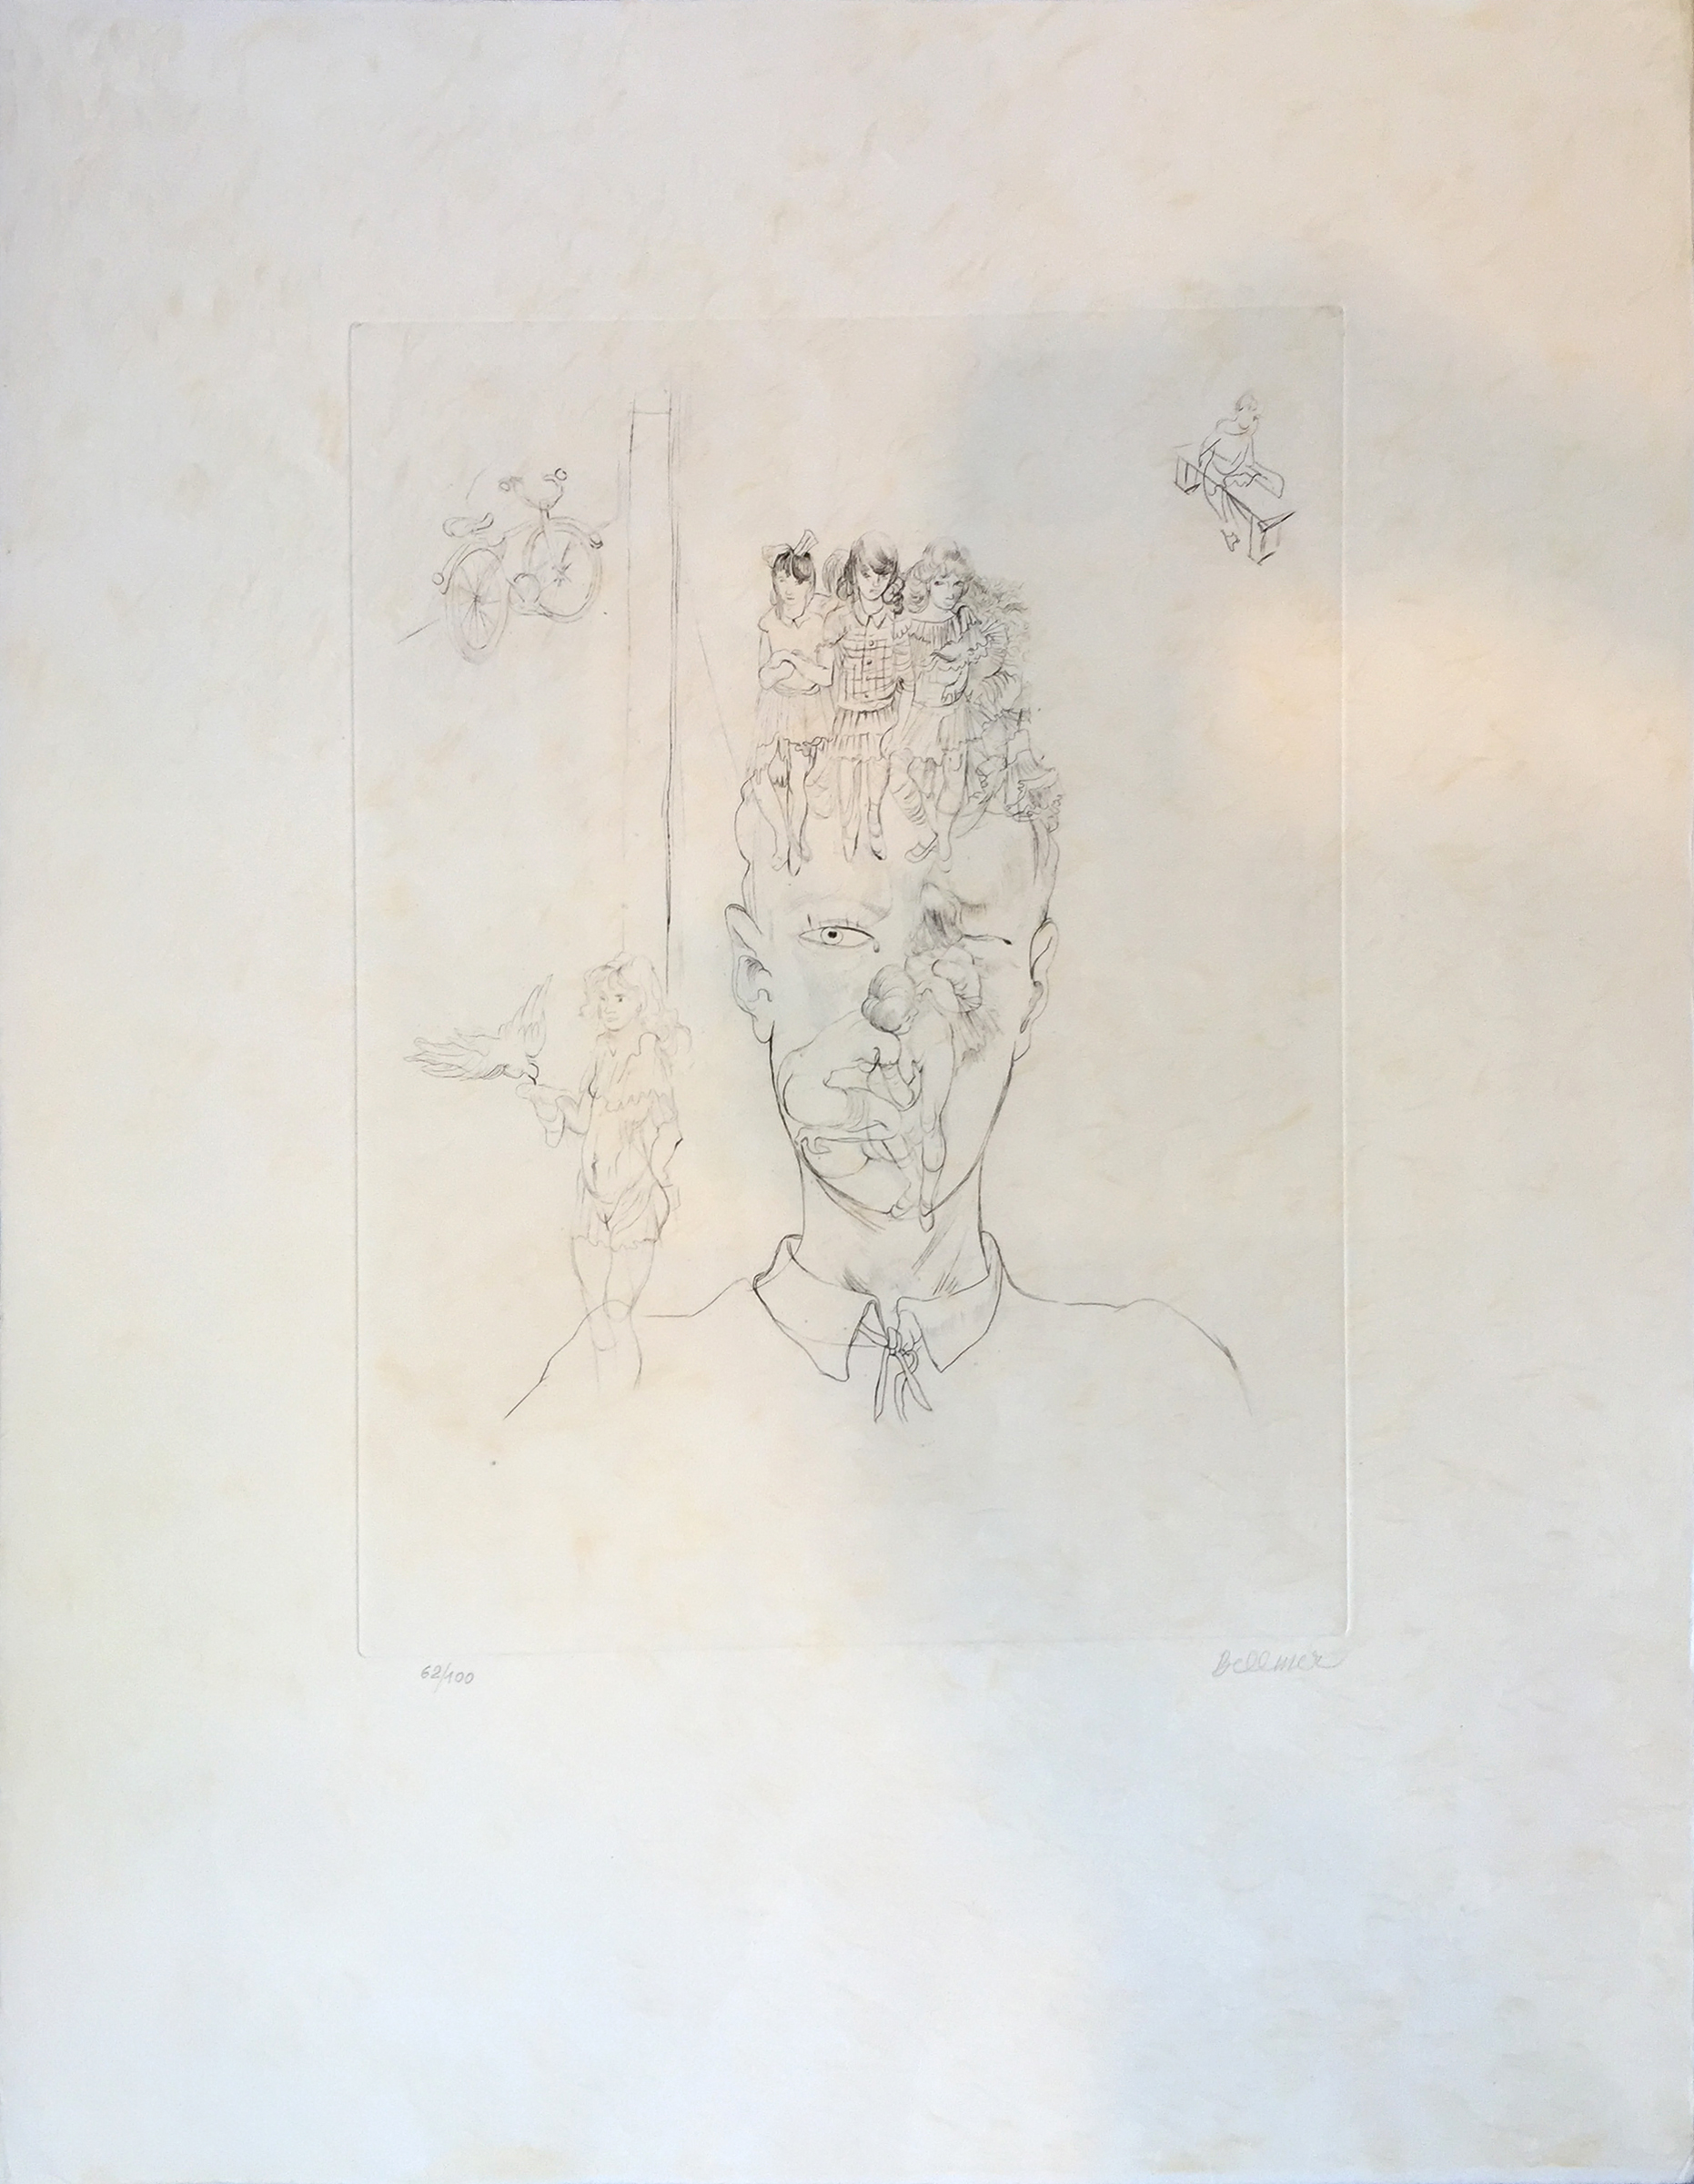 Gedanken (ed. 62 of 100), 1960, 15.75 x 12 inches, Etching